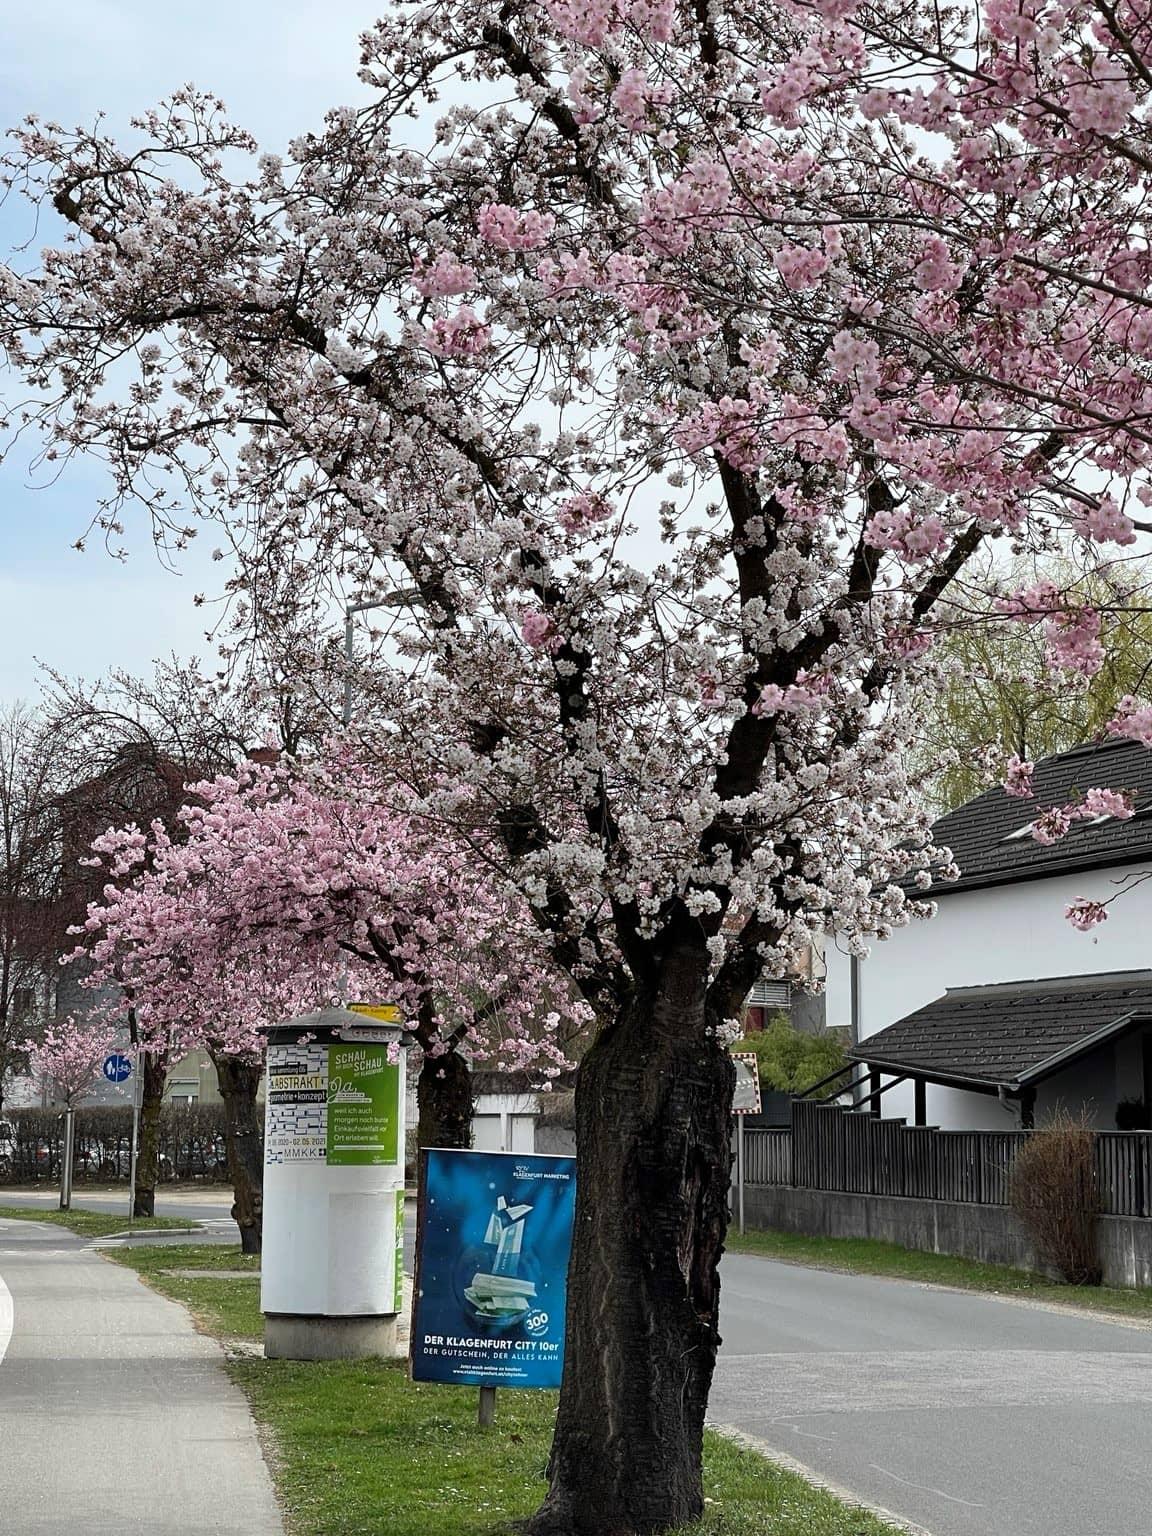 Allee, Kirschblüte, 9020 Klagenfurt am Wörthersee, Frühling, Blüten, rosa